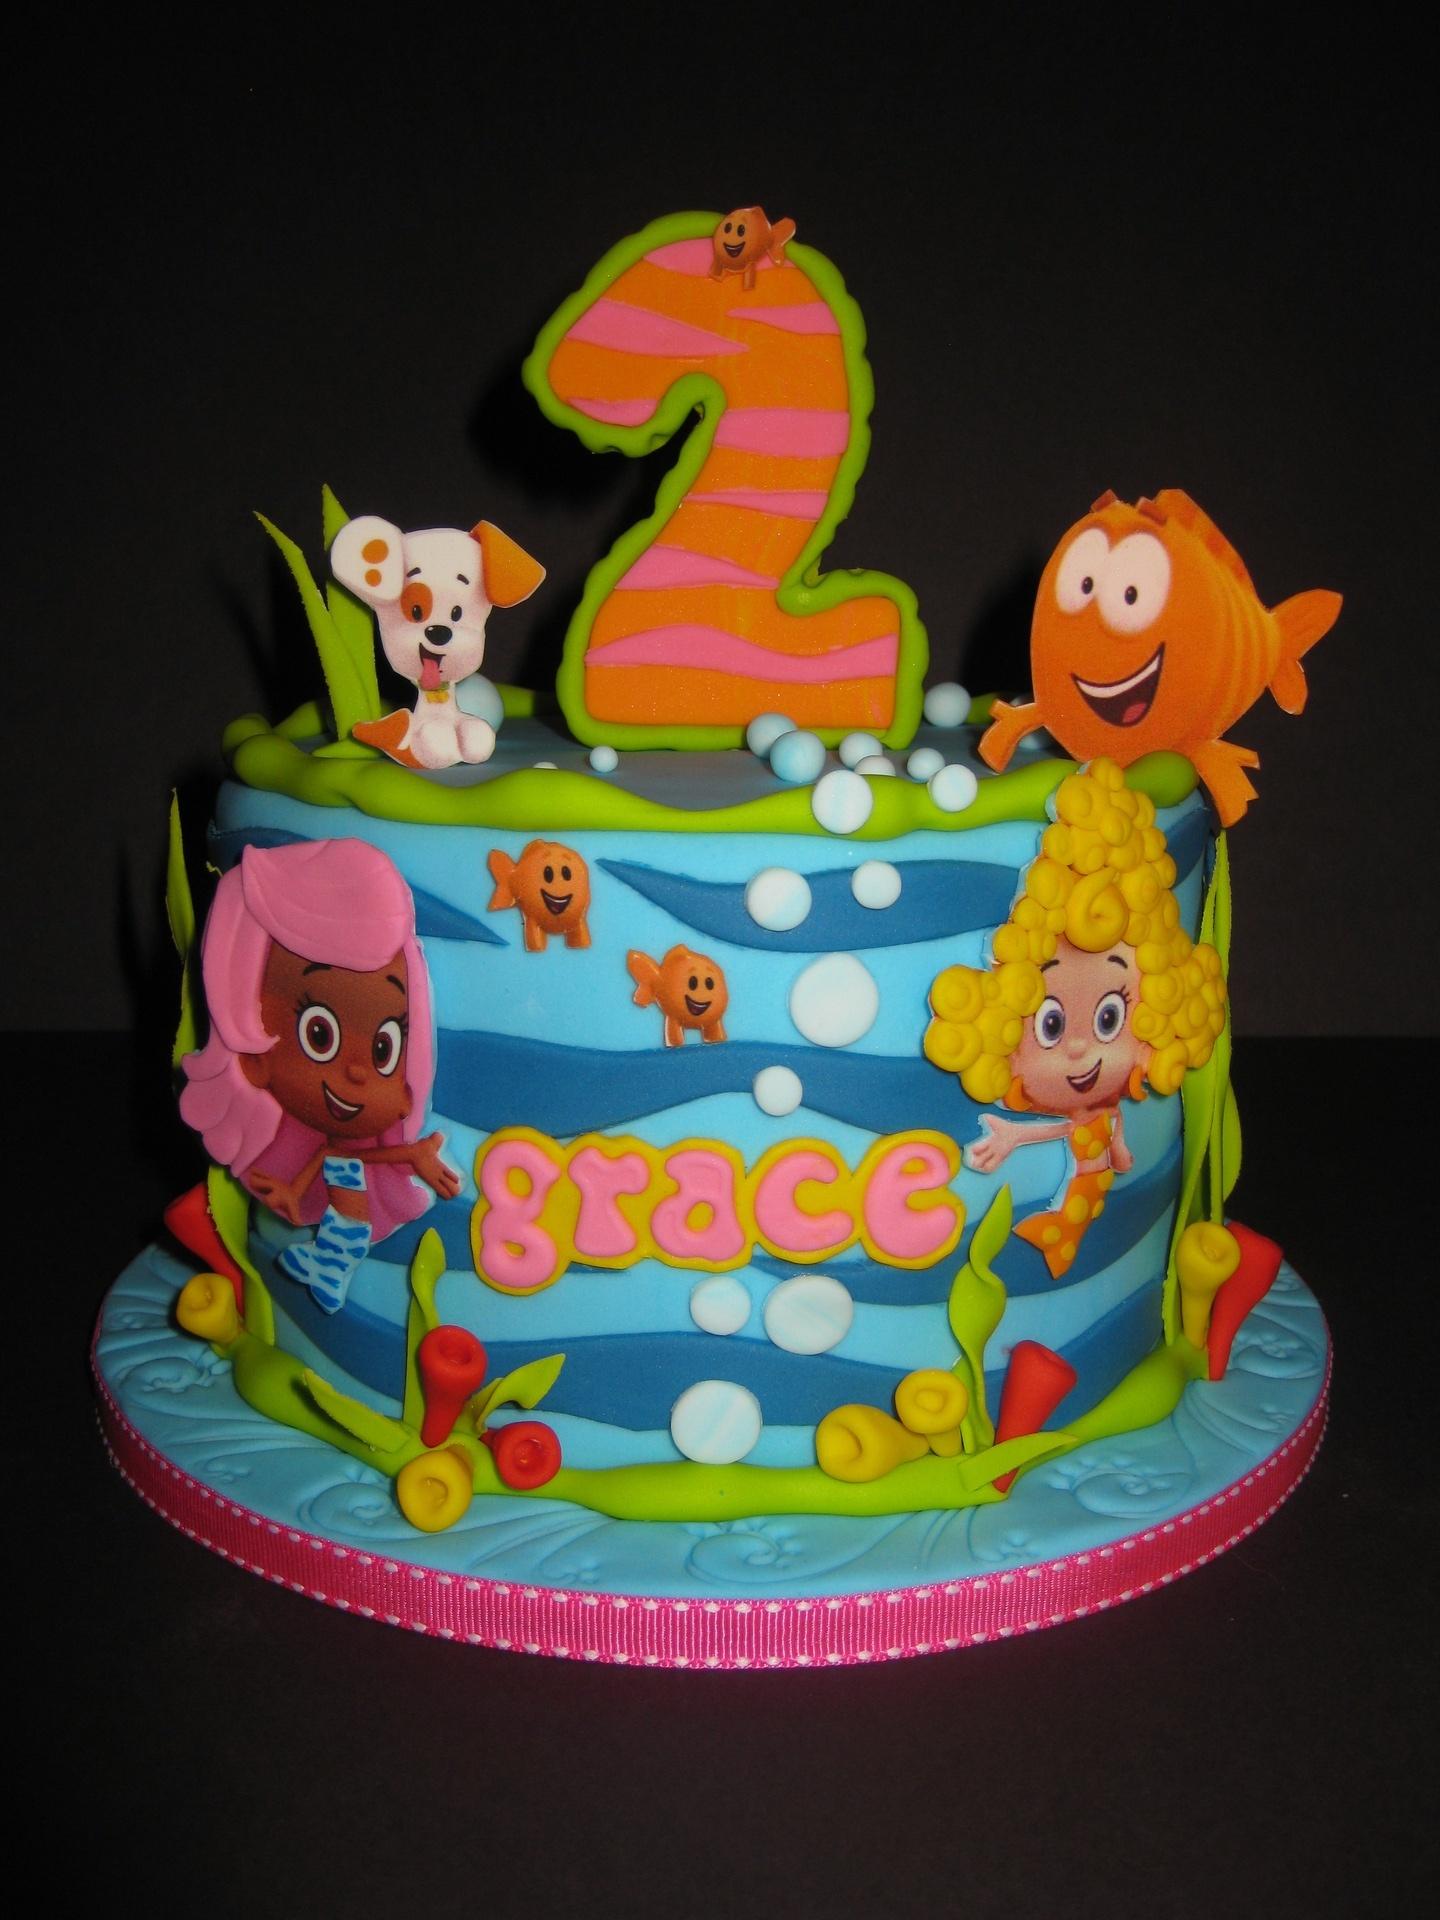 Graces Bubble Guppies Birthday